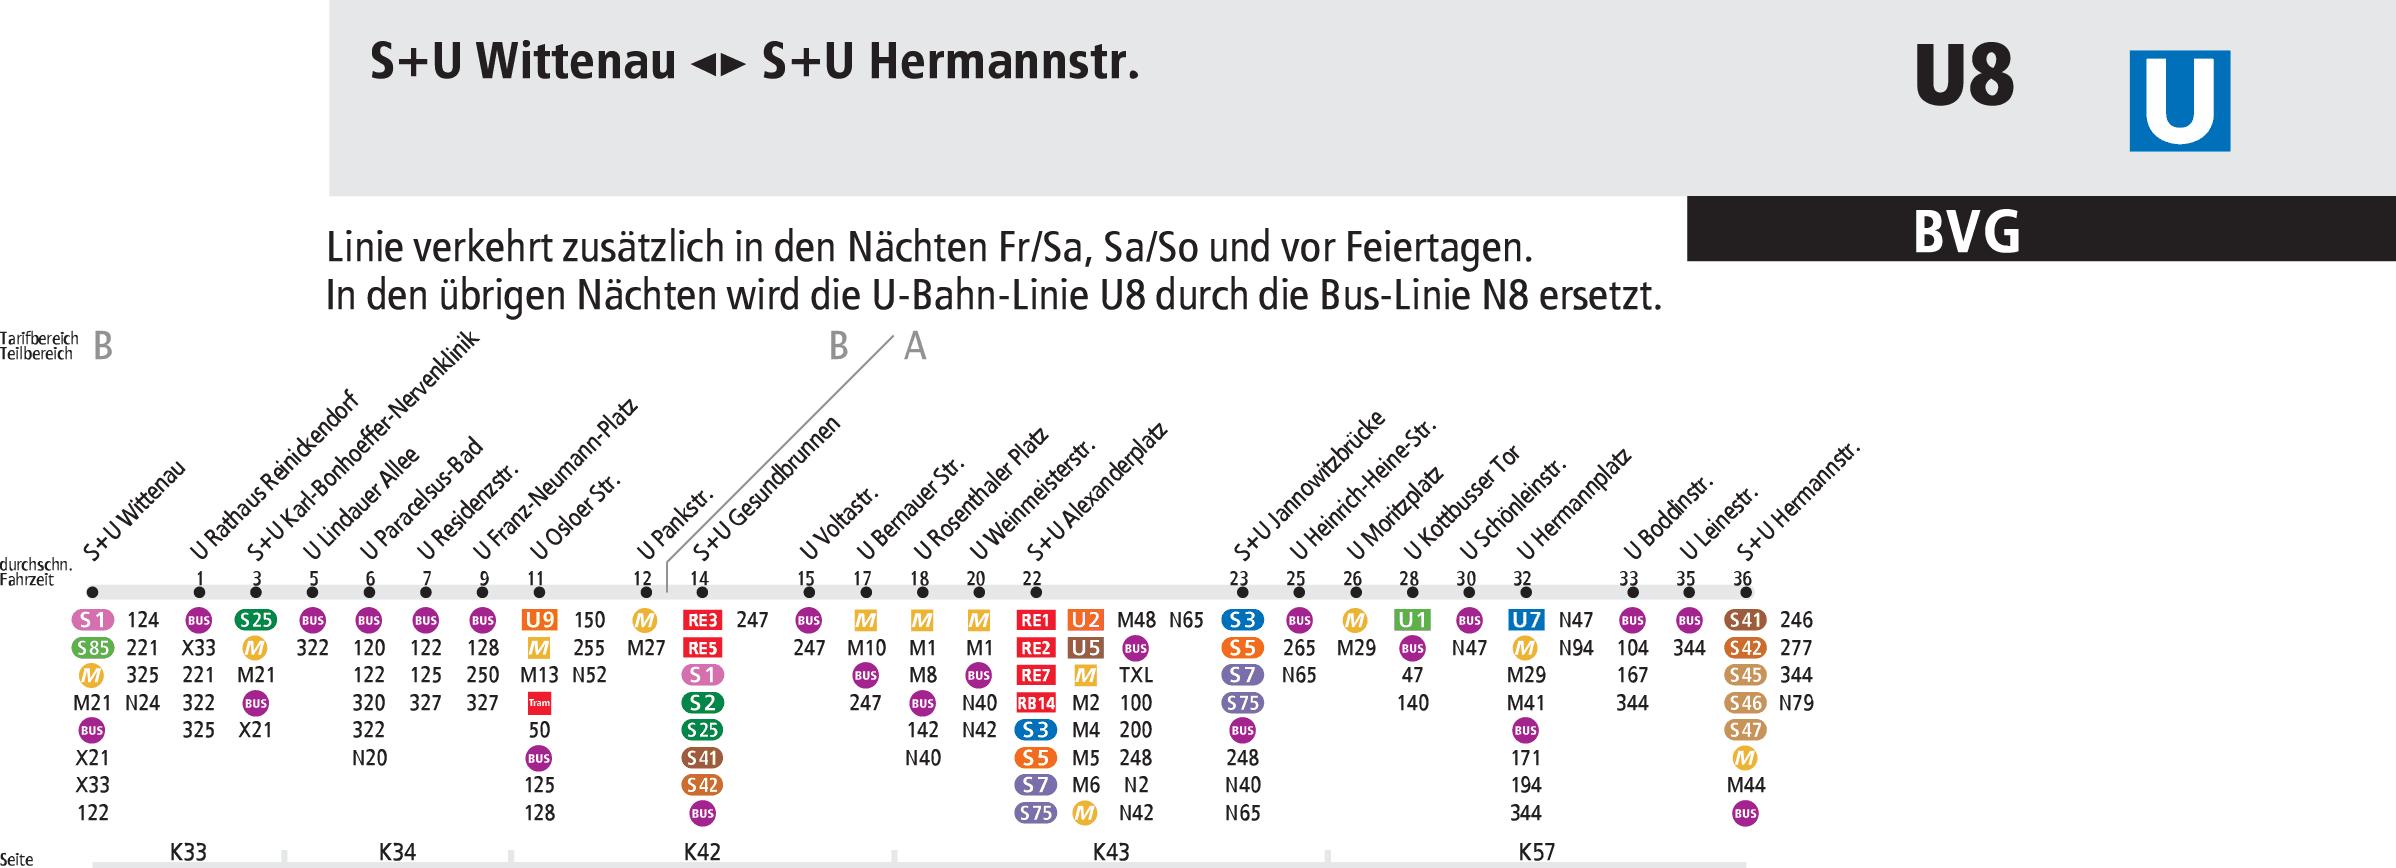 Karta Berlin Bvg.Mapa Metro Berlin Berlin U Bahn Mapa Metro